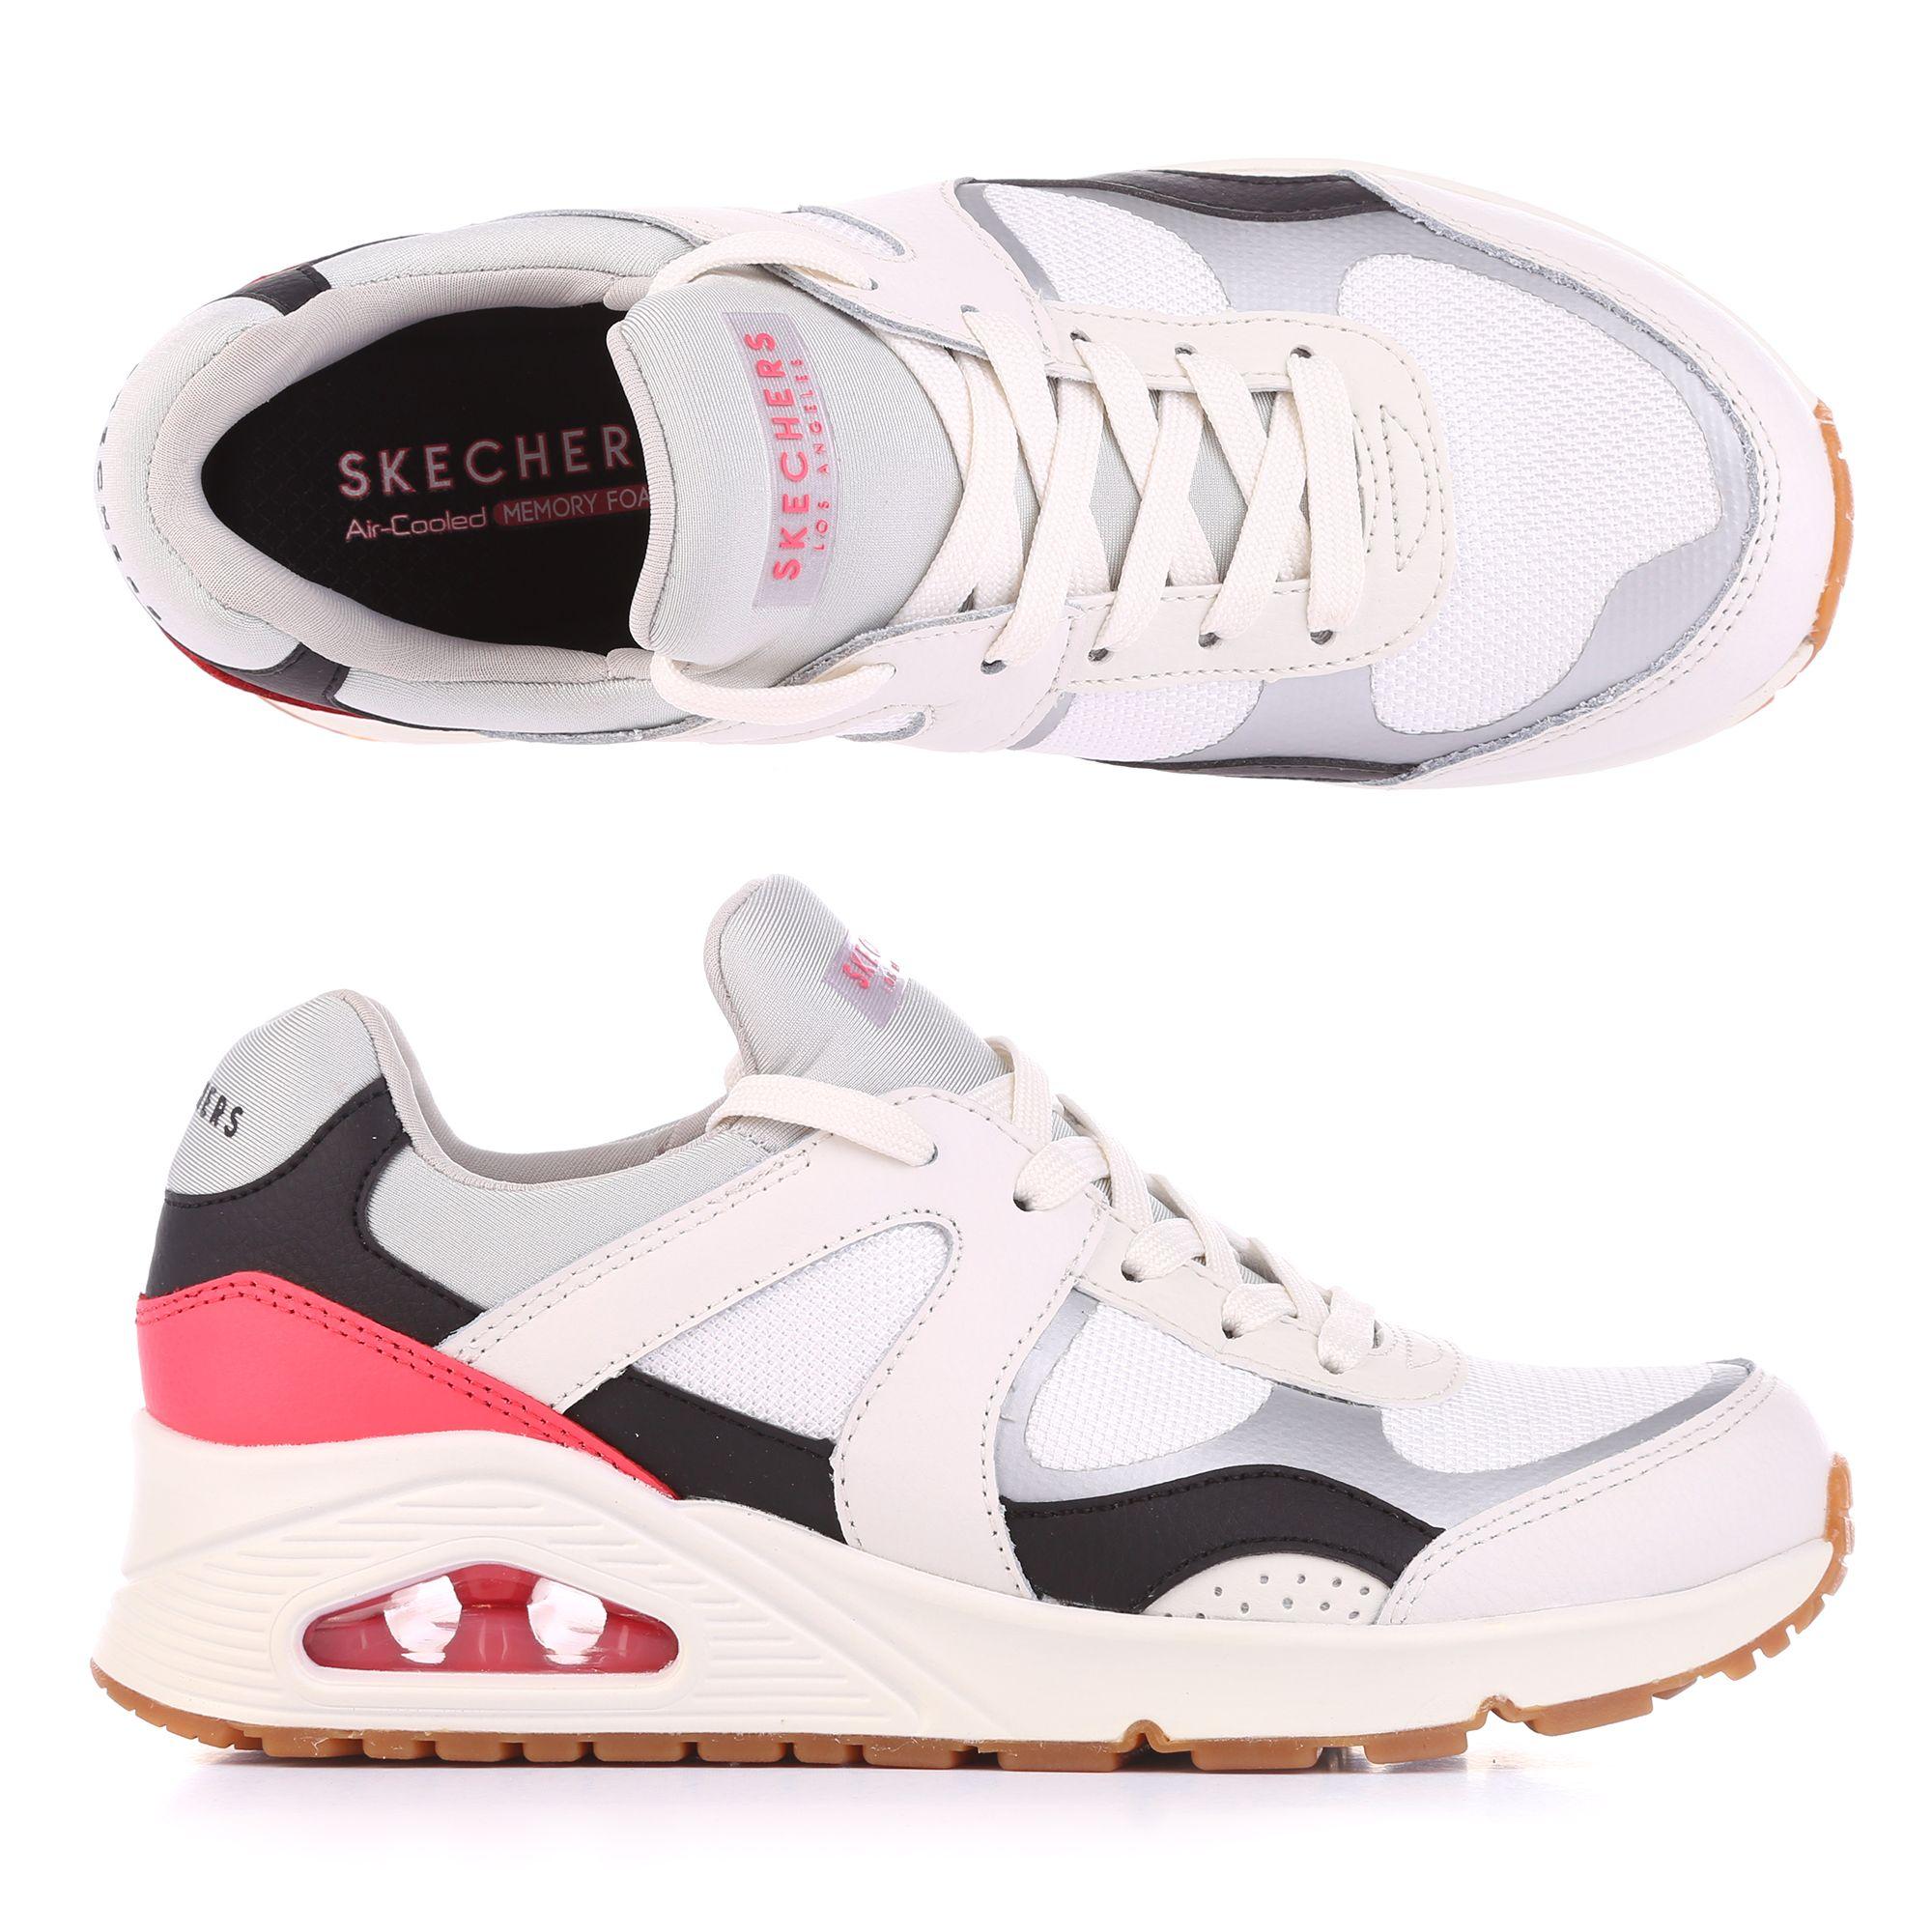 c054fb8d13 SKECHERS Damen-Sneaker Uno Materialmix Memory Foam — QVC.de